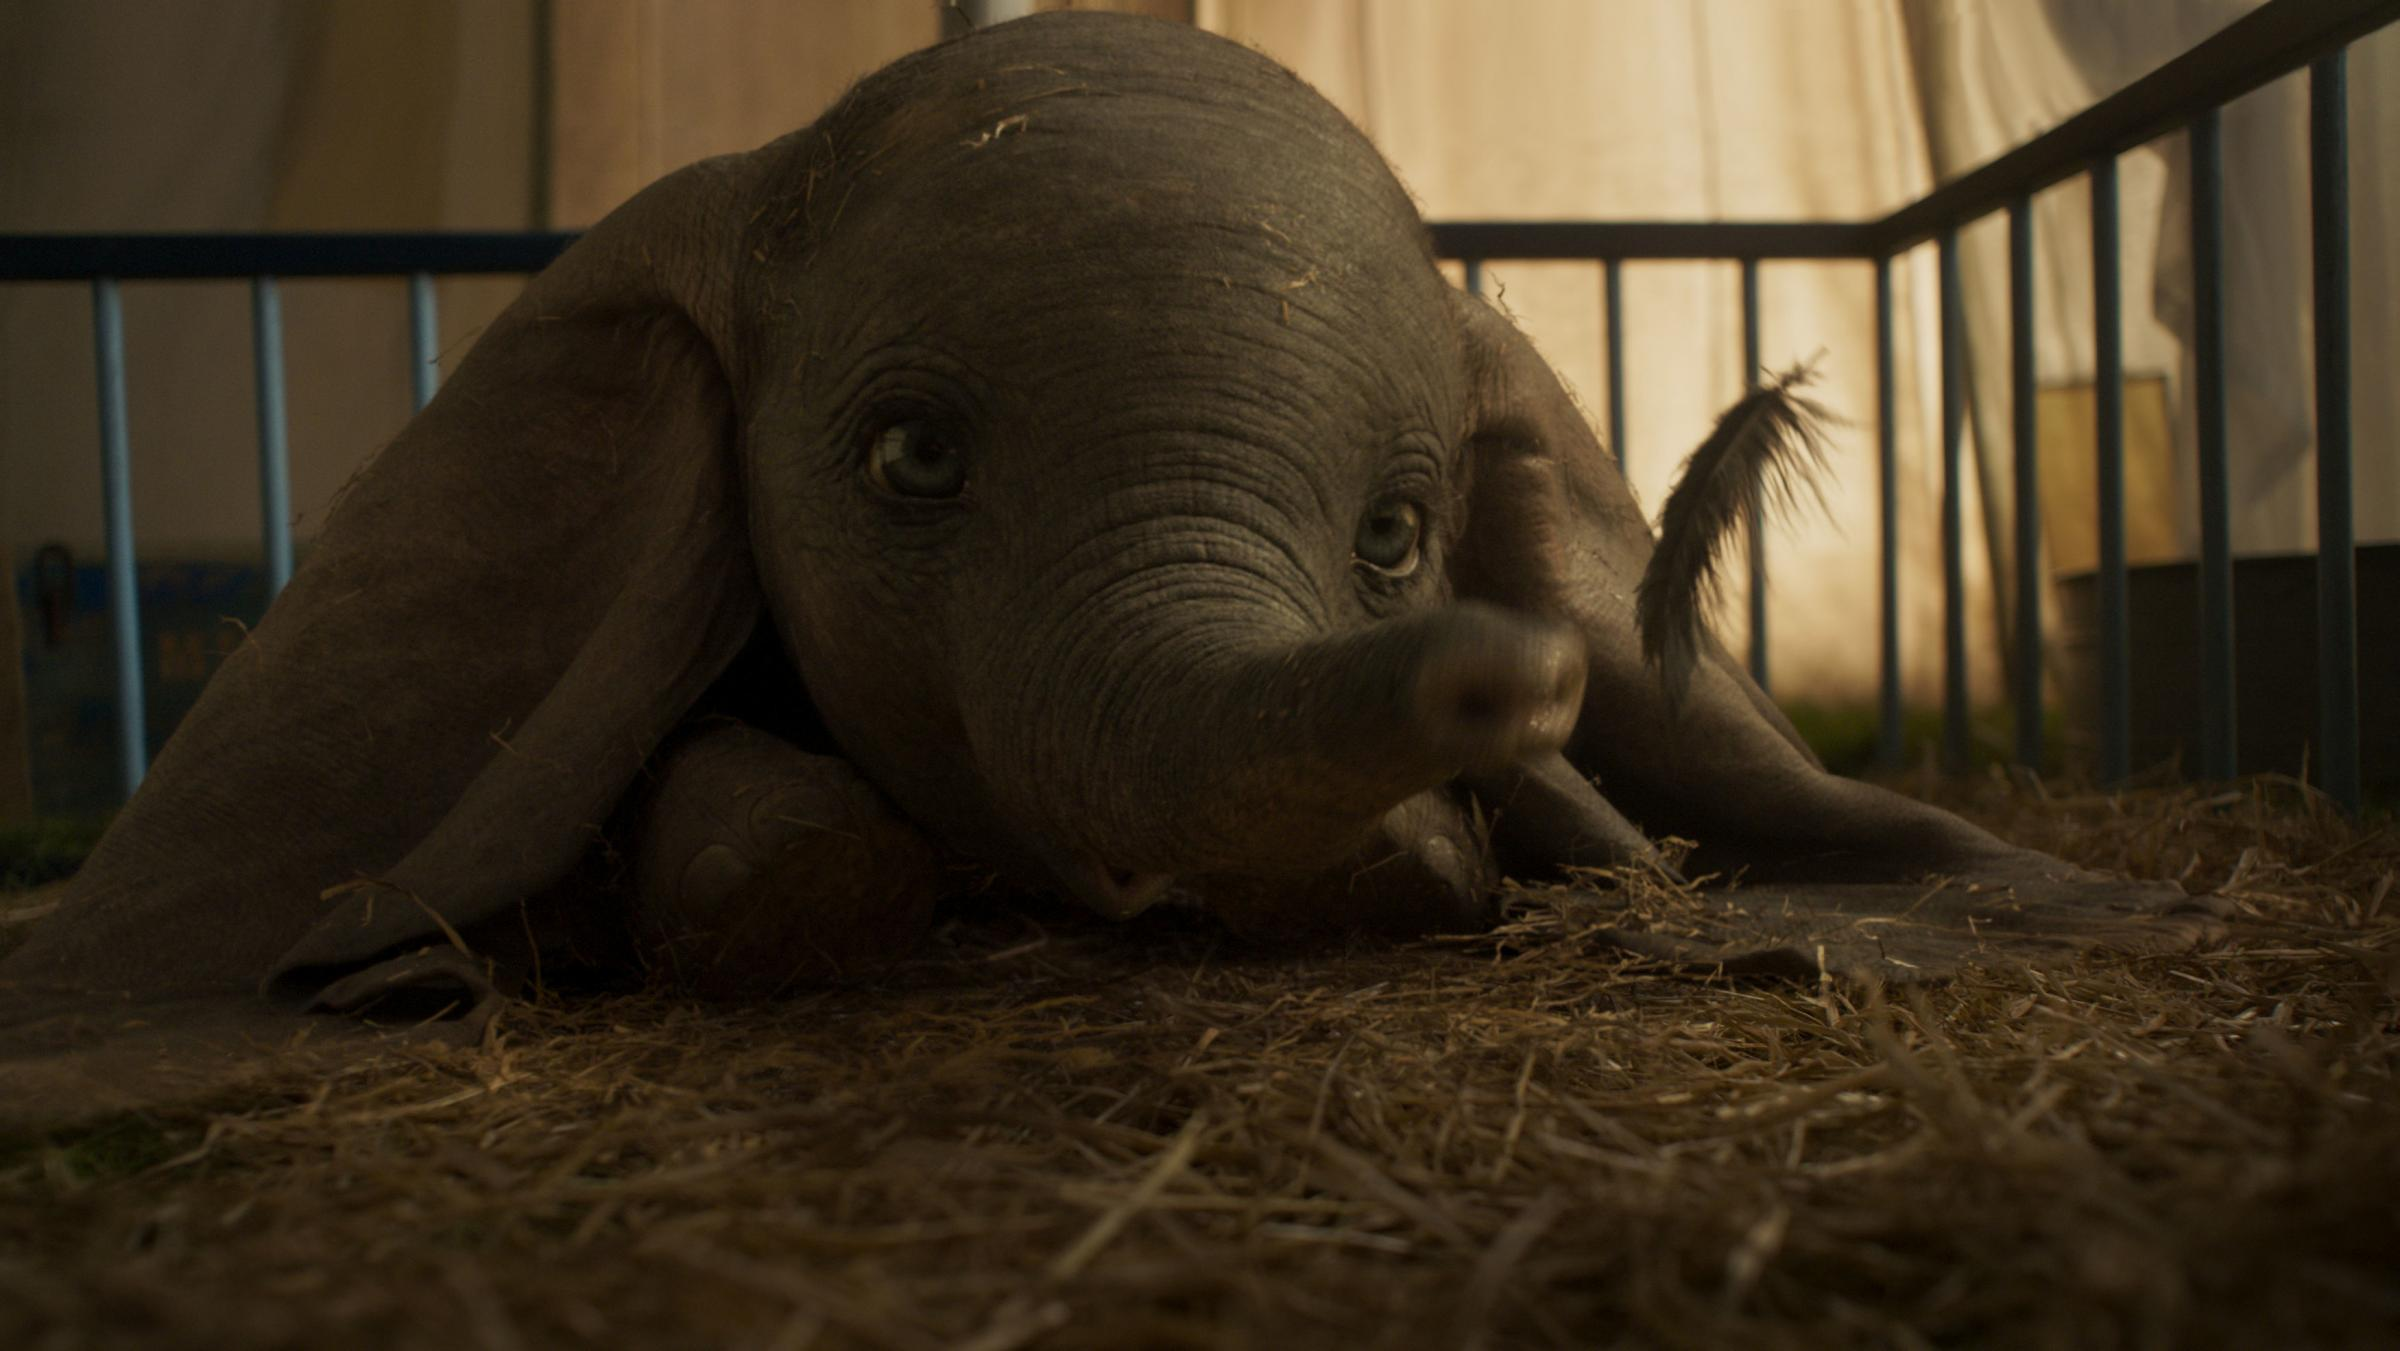 Cinema review: Dumbo